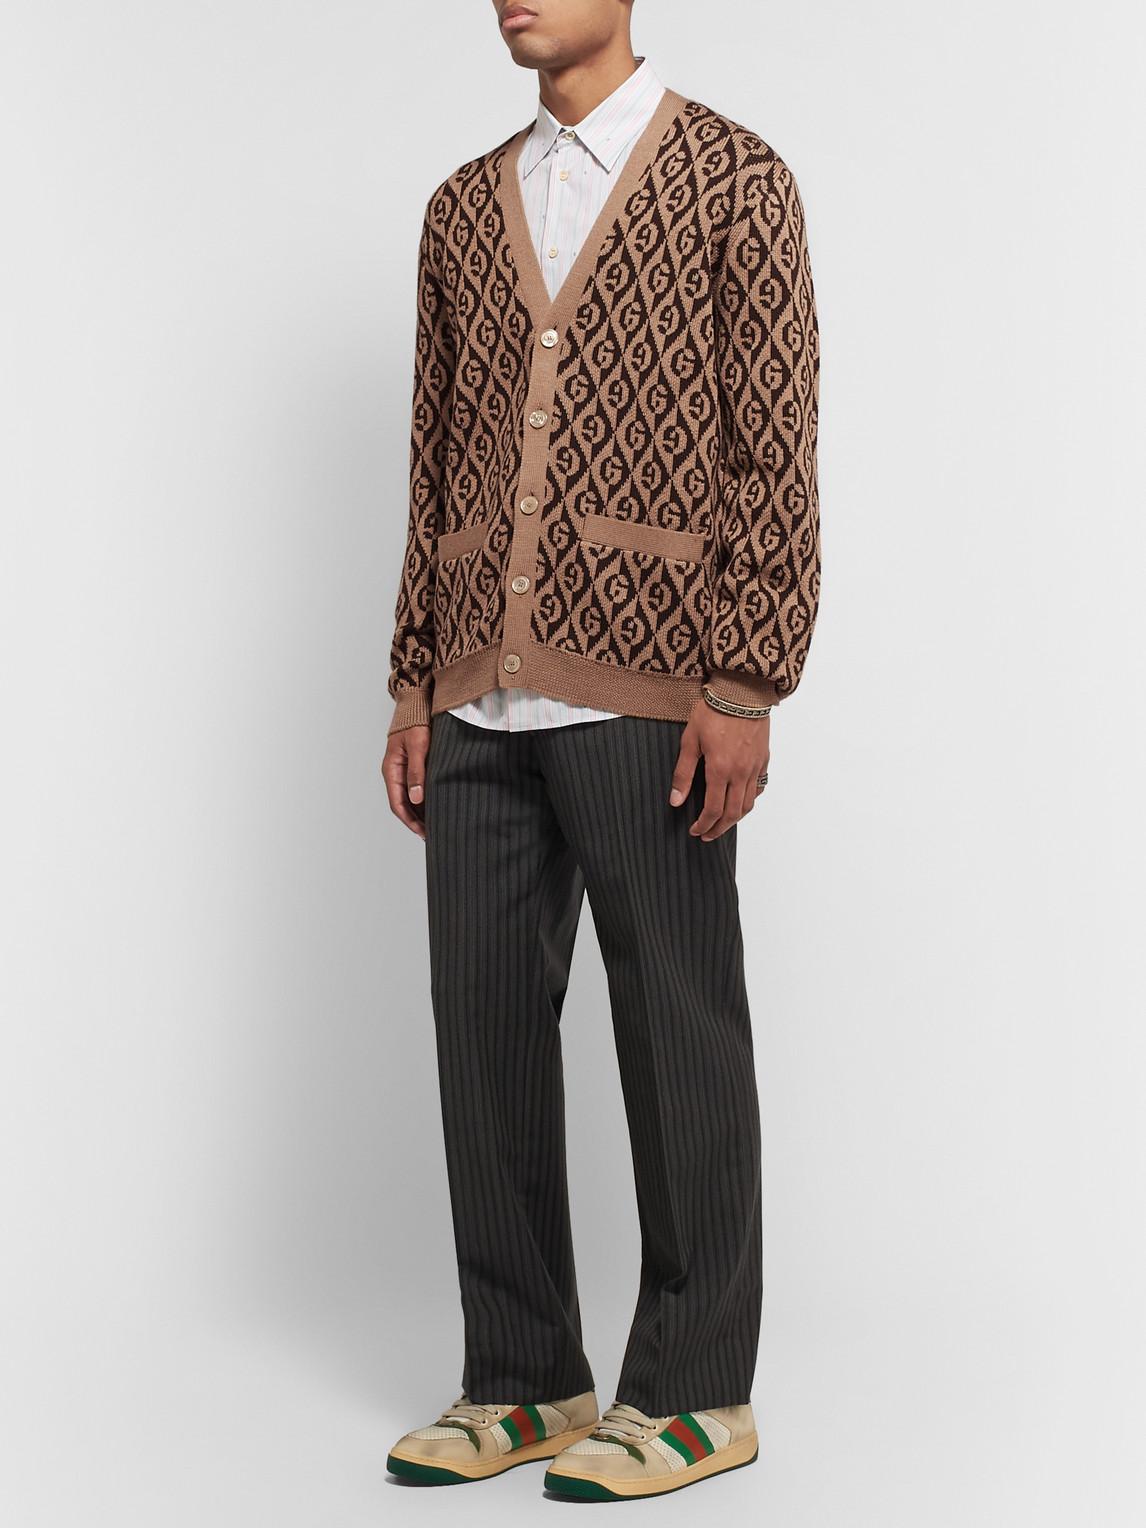 Gucci Men's Rhombus Intarsia-knit Cardigan Sweater In Beige